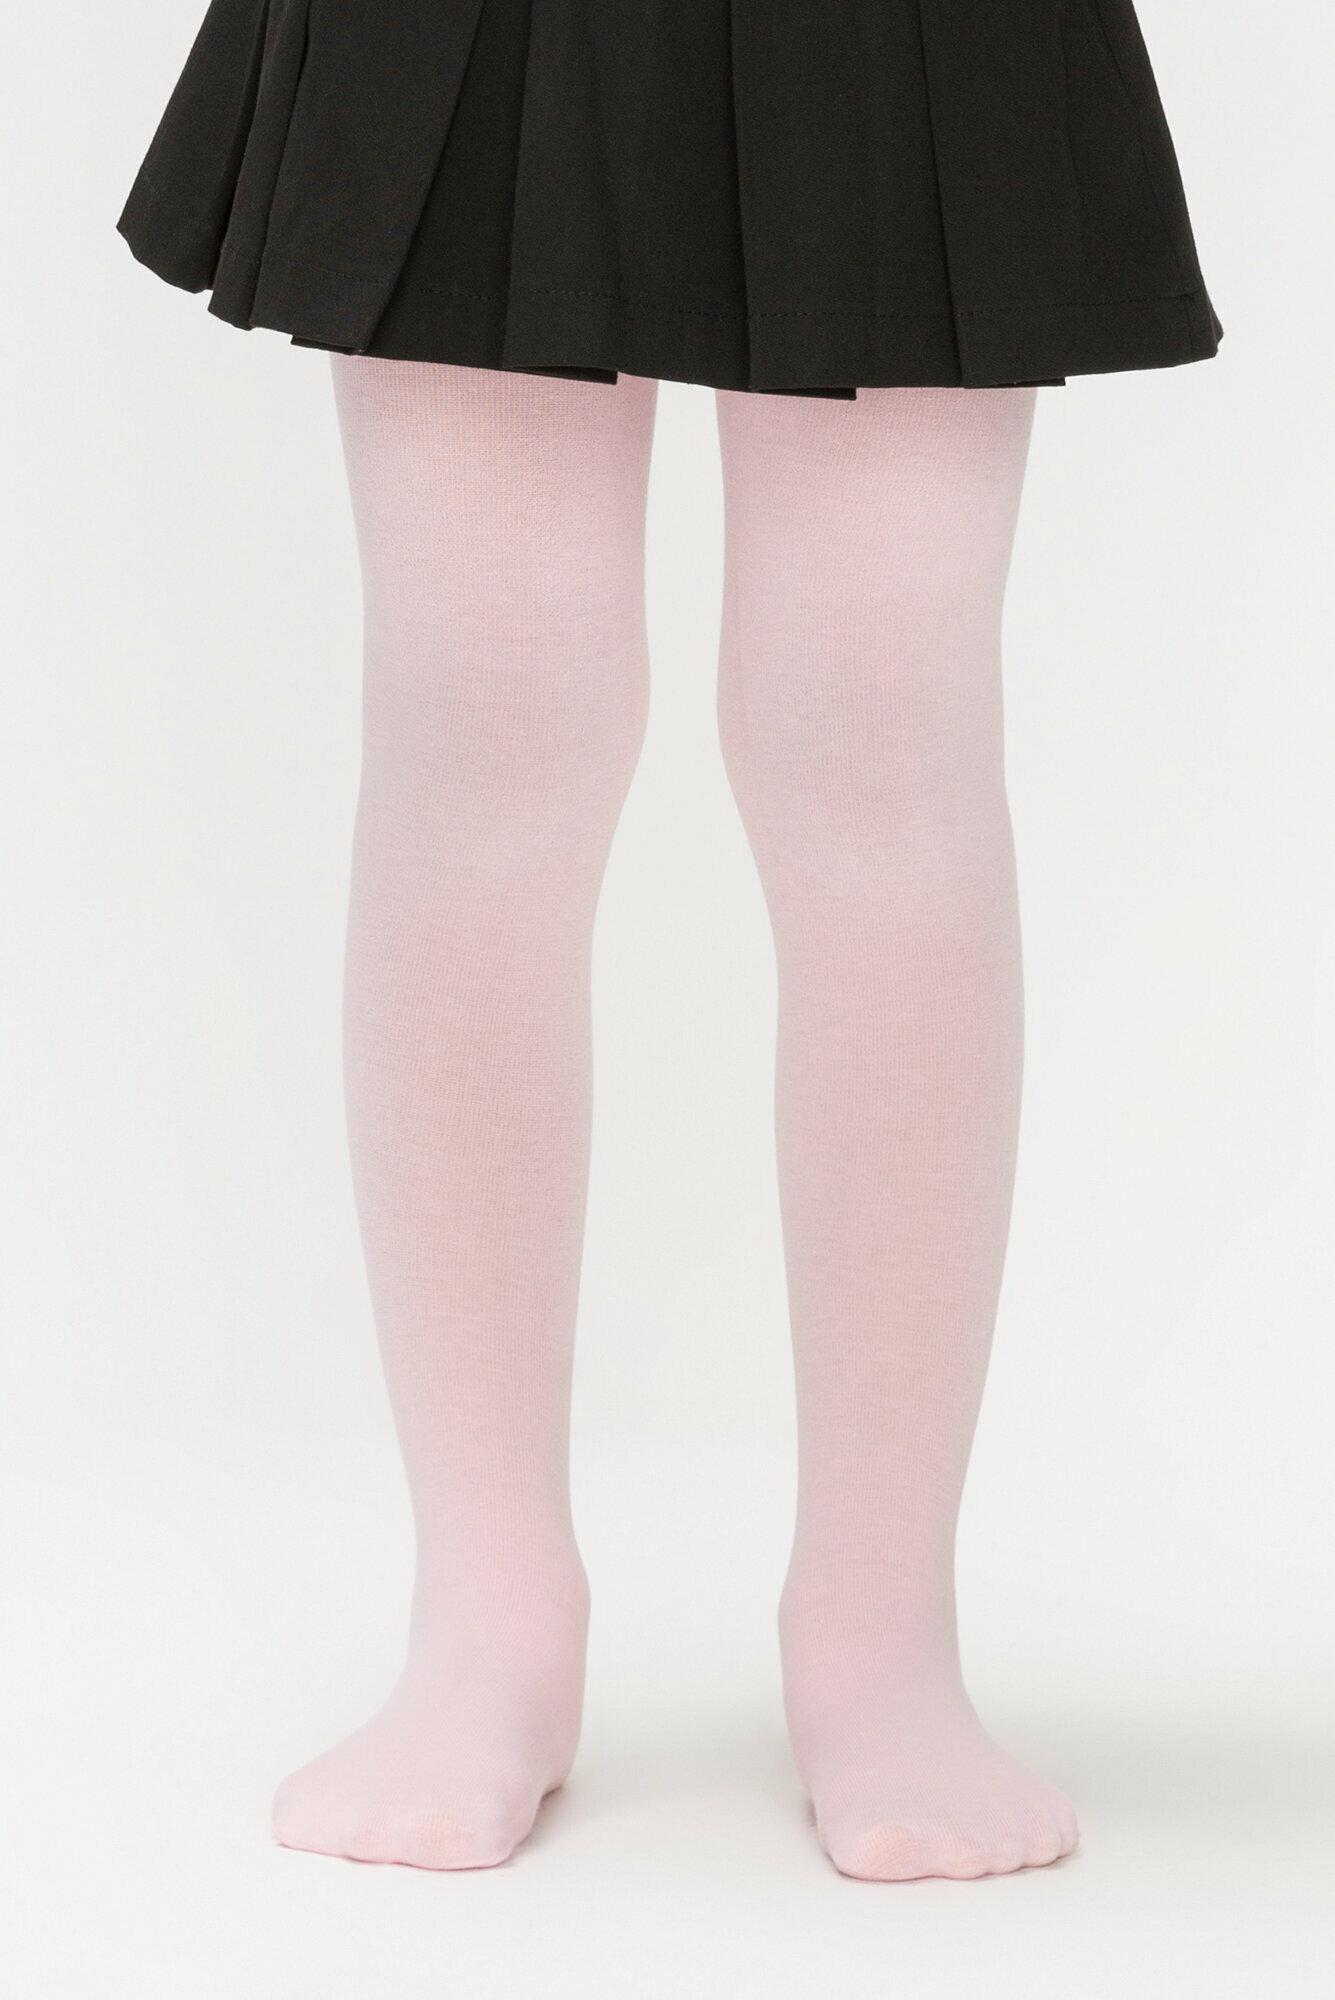 Penti Strumpfhose Extra Baumwolle rosa